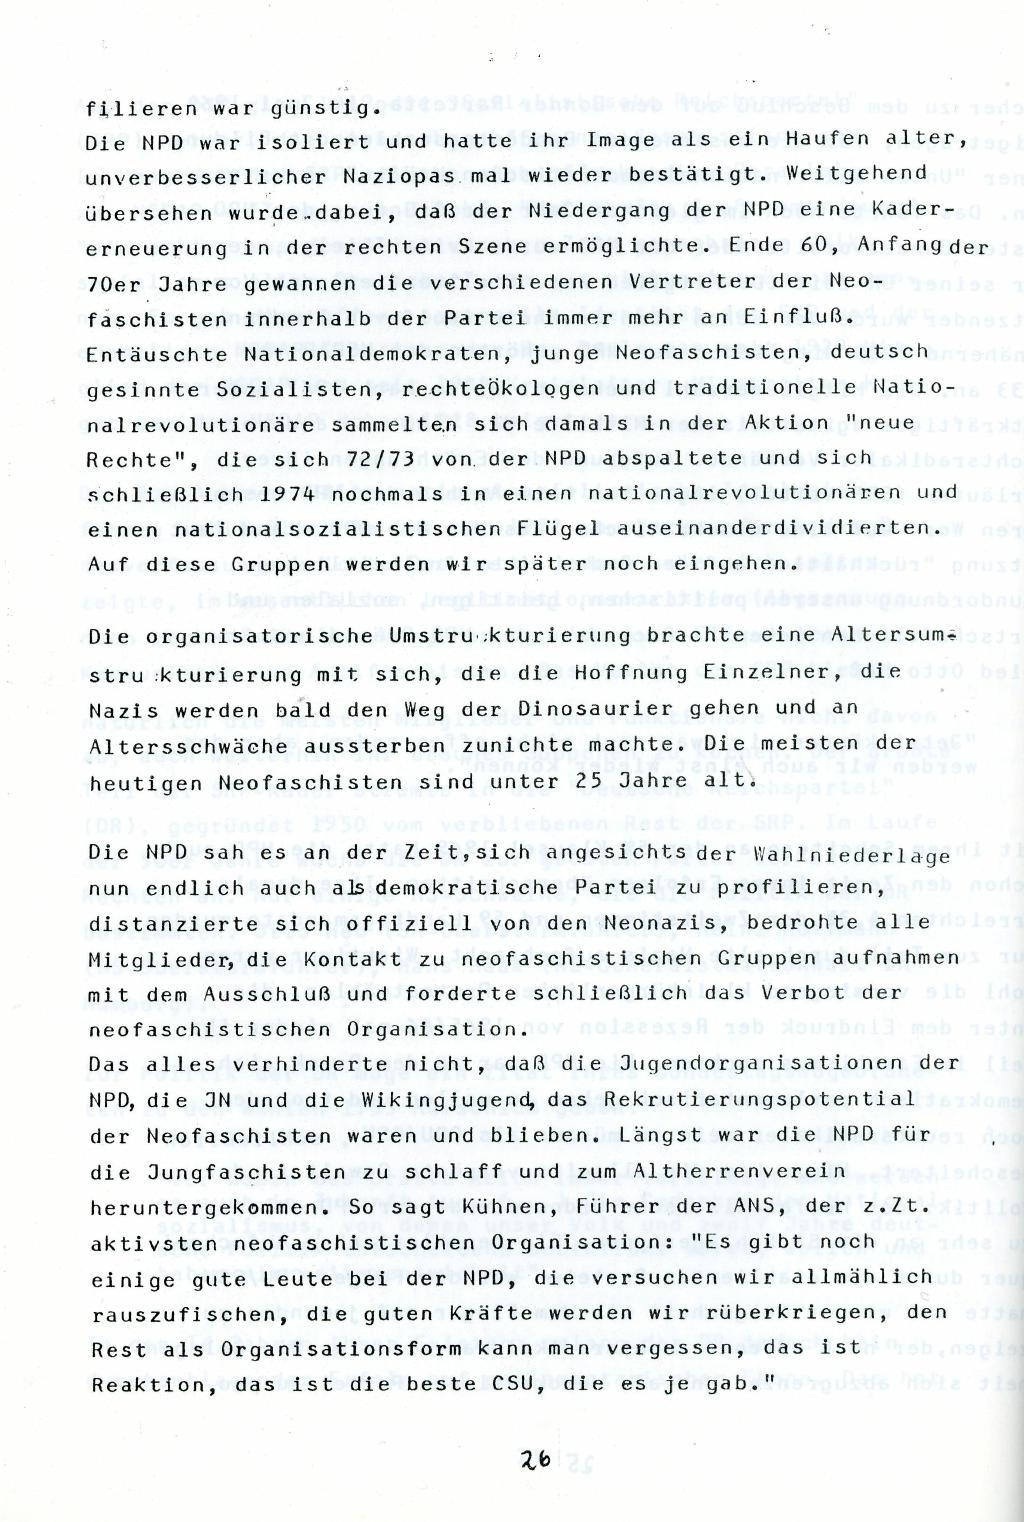 Berlin_1983_Autonome_Gruppen_Faschismus_im_Kapitalismus_26